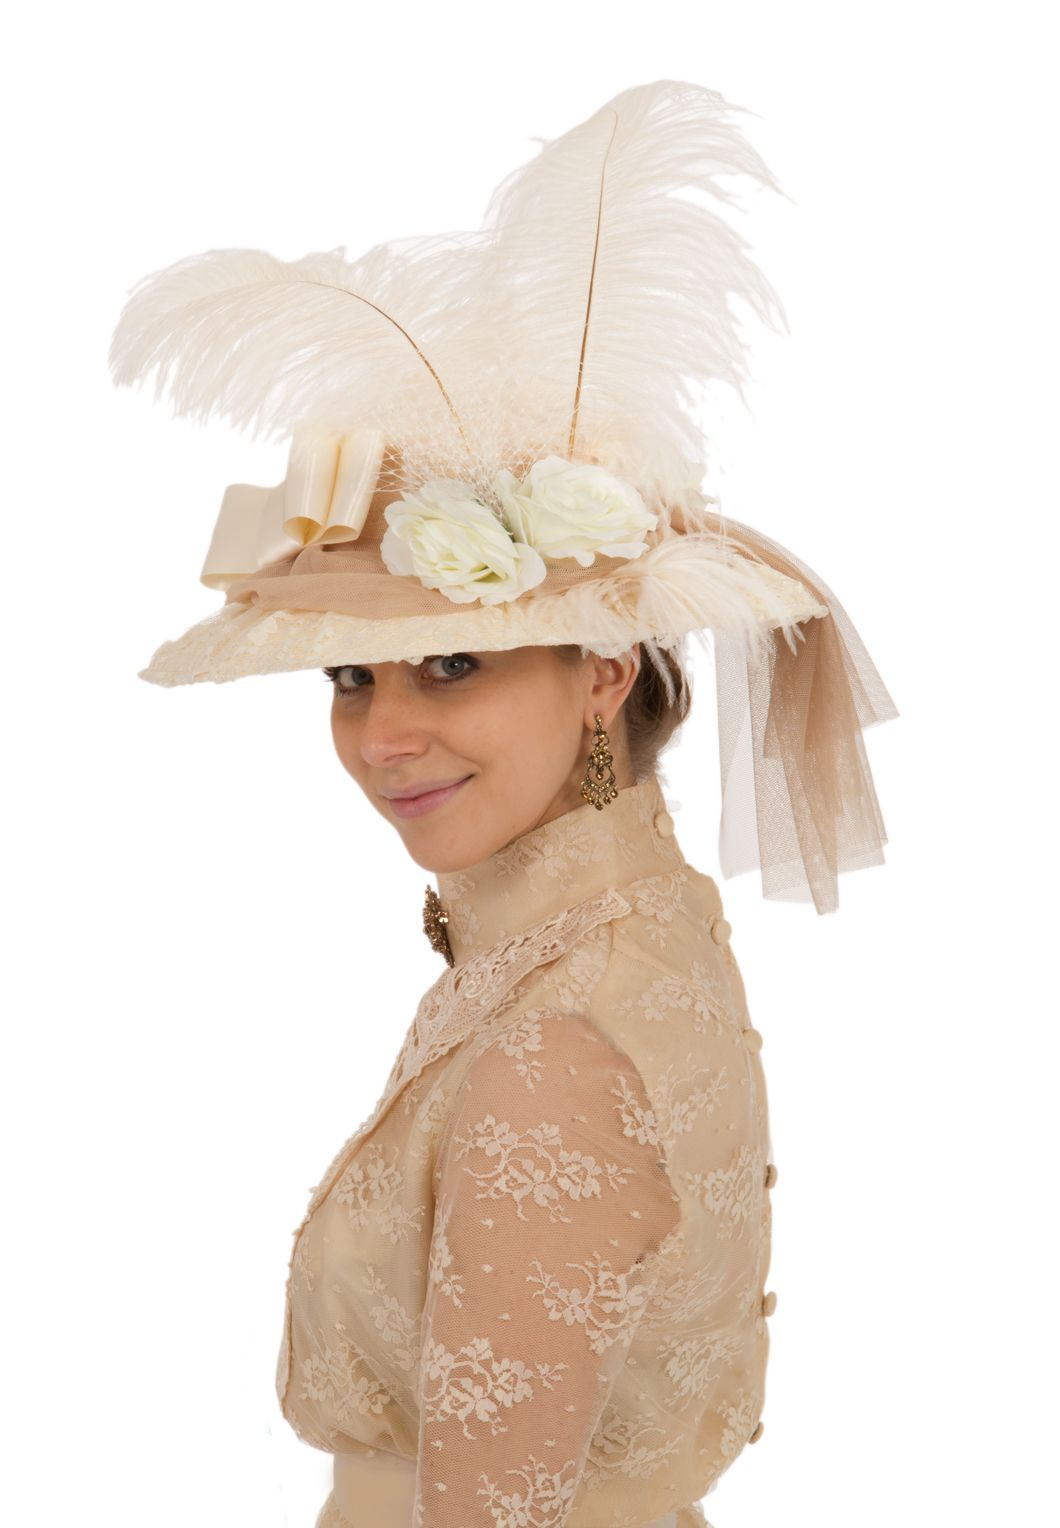 Natasha Antique Lace Edwardian Hat By Recollections  930d7e6cadb